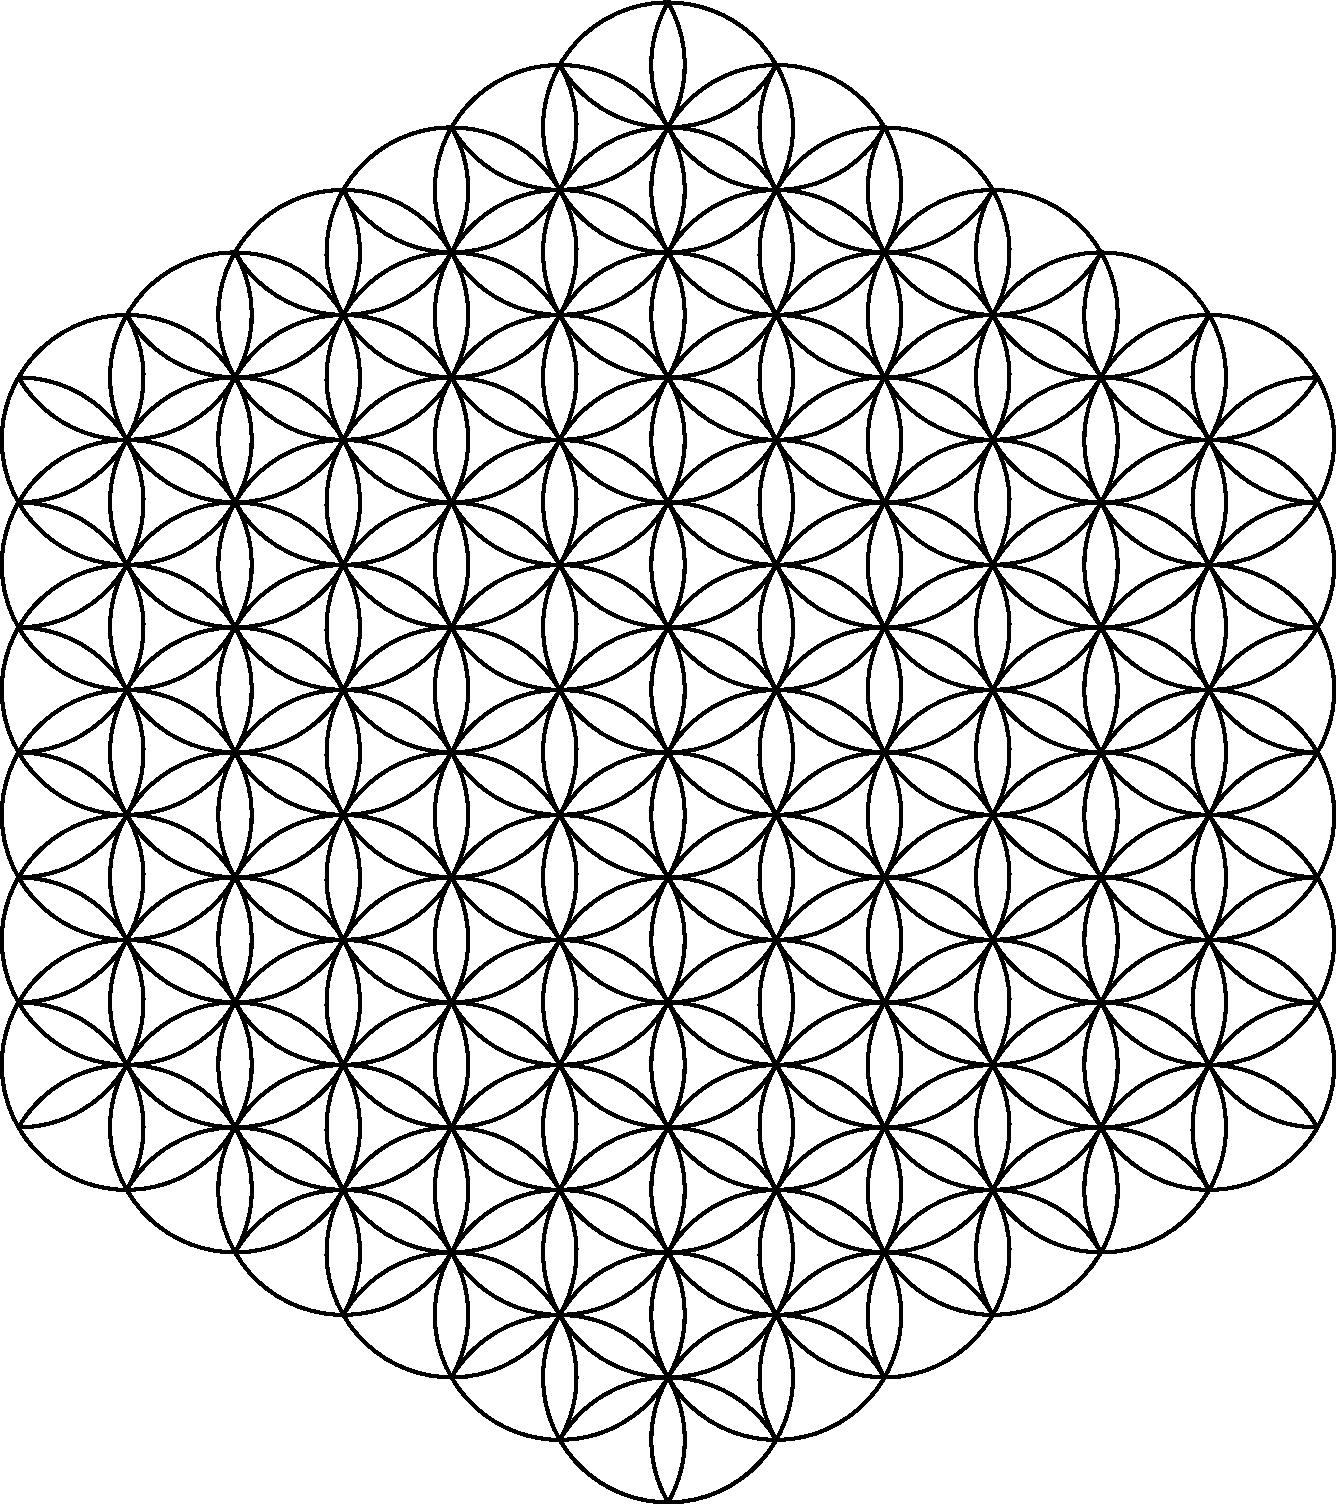 Flower Of Life 91circles36arcs Png 1 336 1 504 Pixels Coloriage Geometrie Tatouage